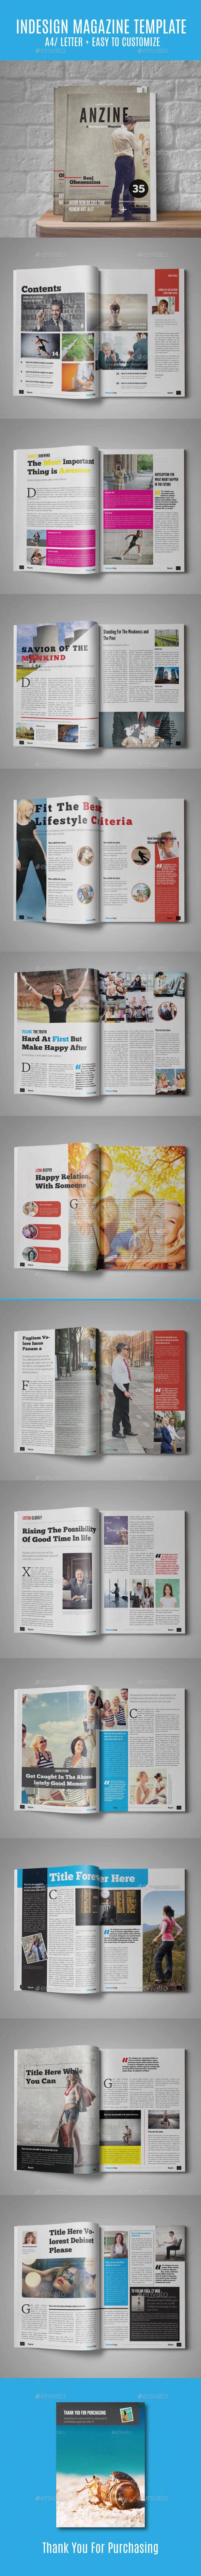 Anzine Magazine Template - Magazines Print Templates